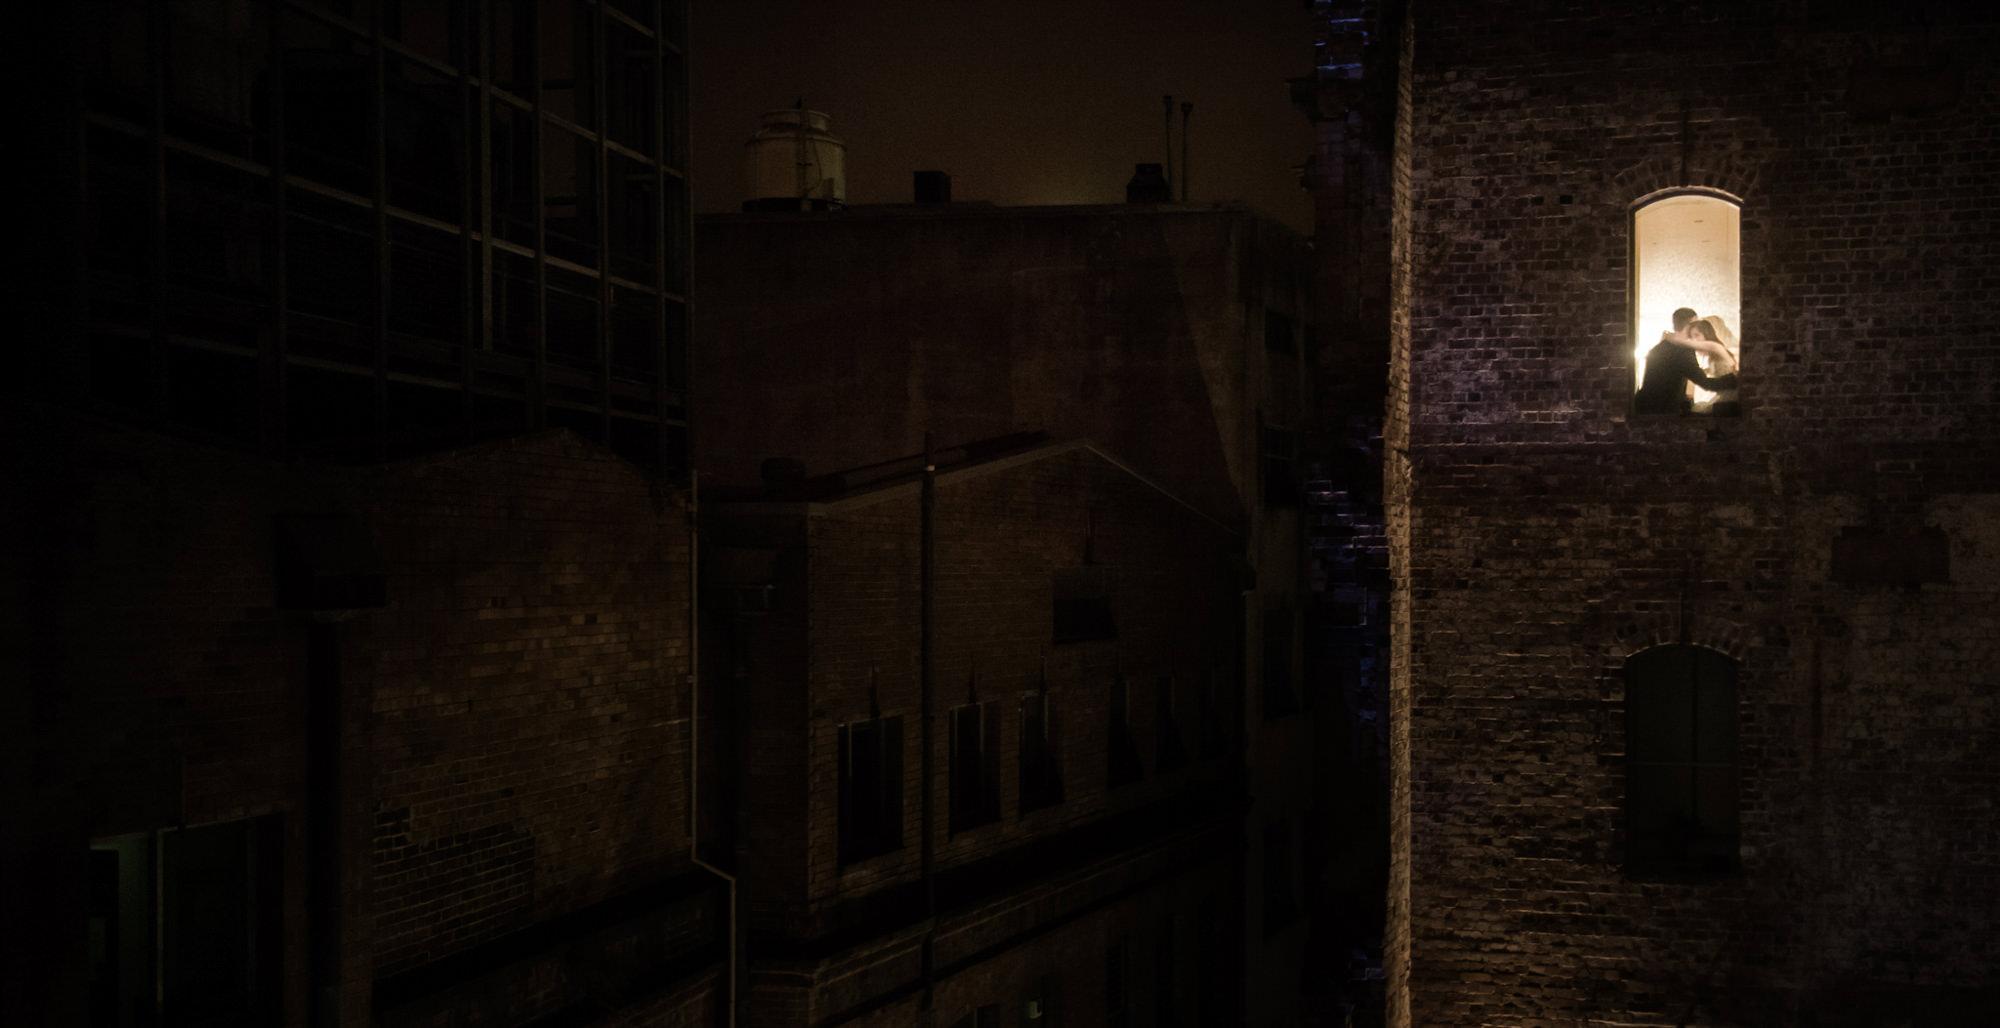 Moody portrait of couple in window of brick building - Studio Impressions